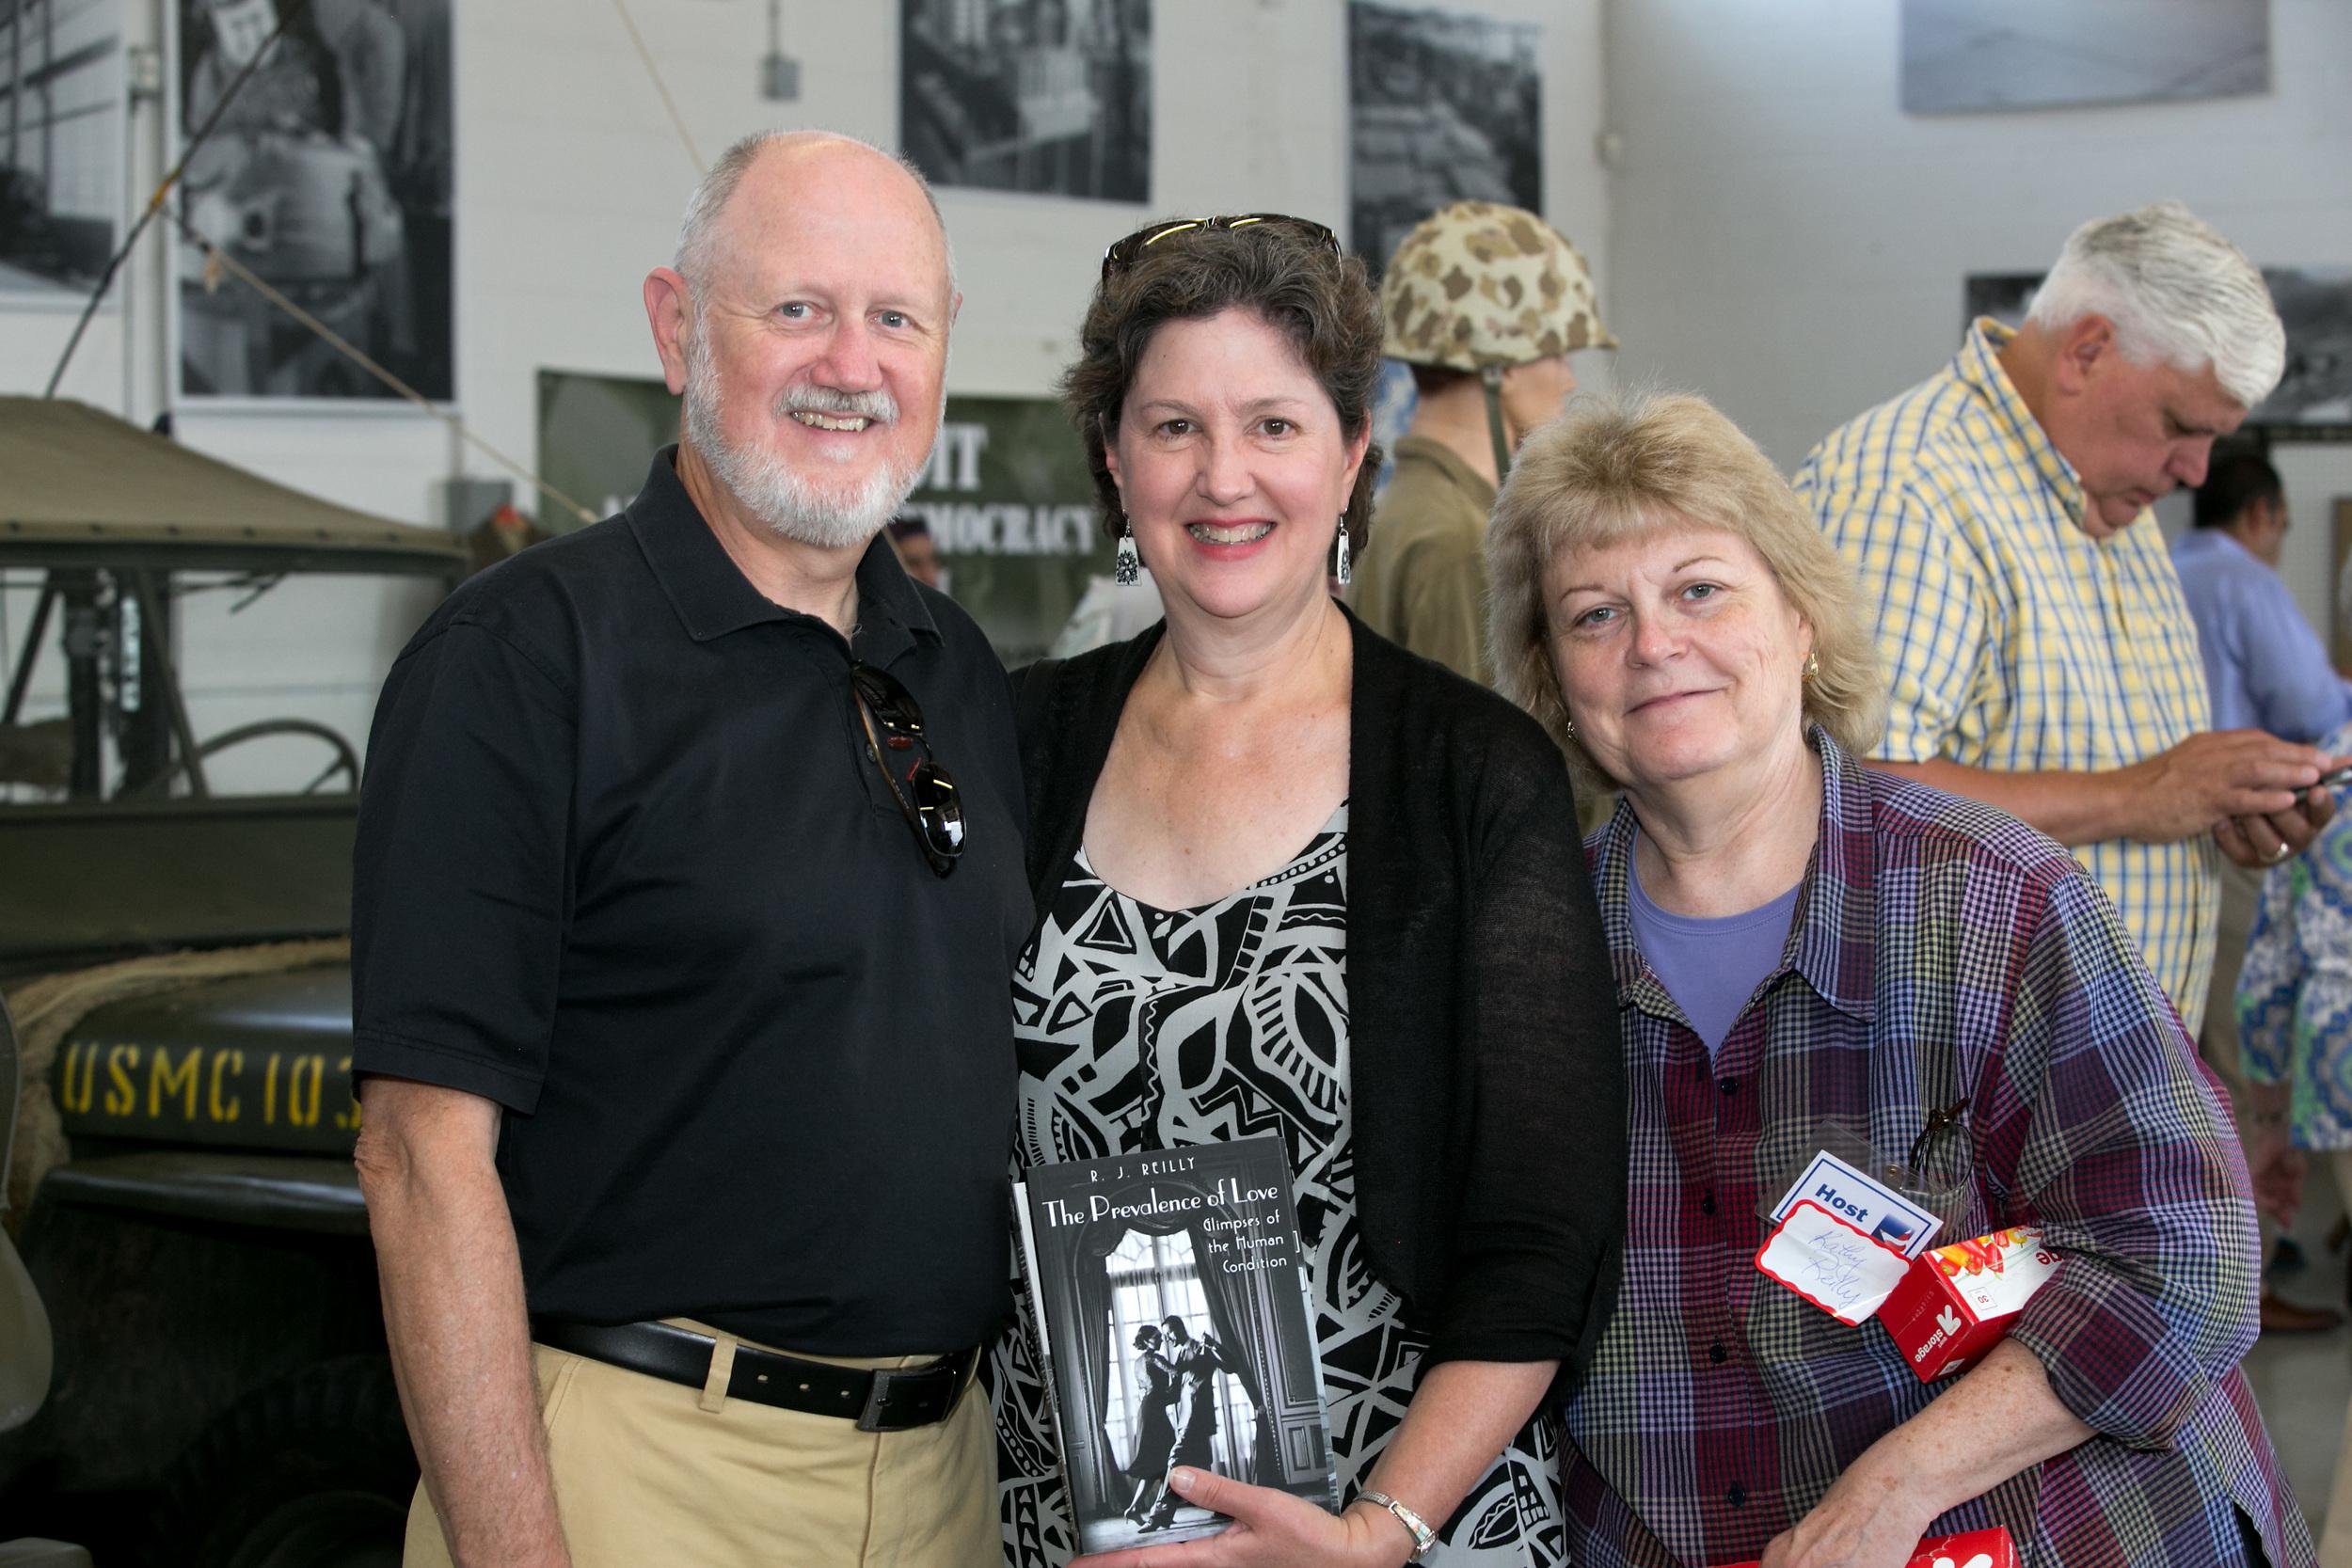 Don Haffner Carol Benson Kathy Reilly.jpg